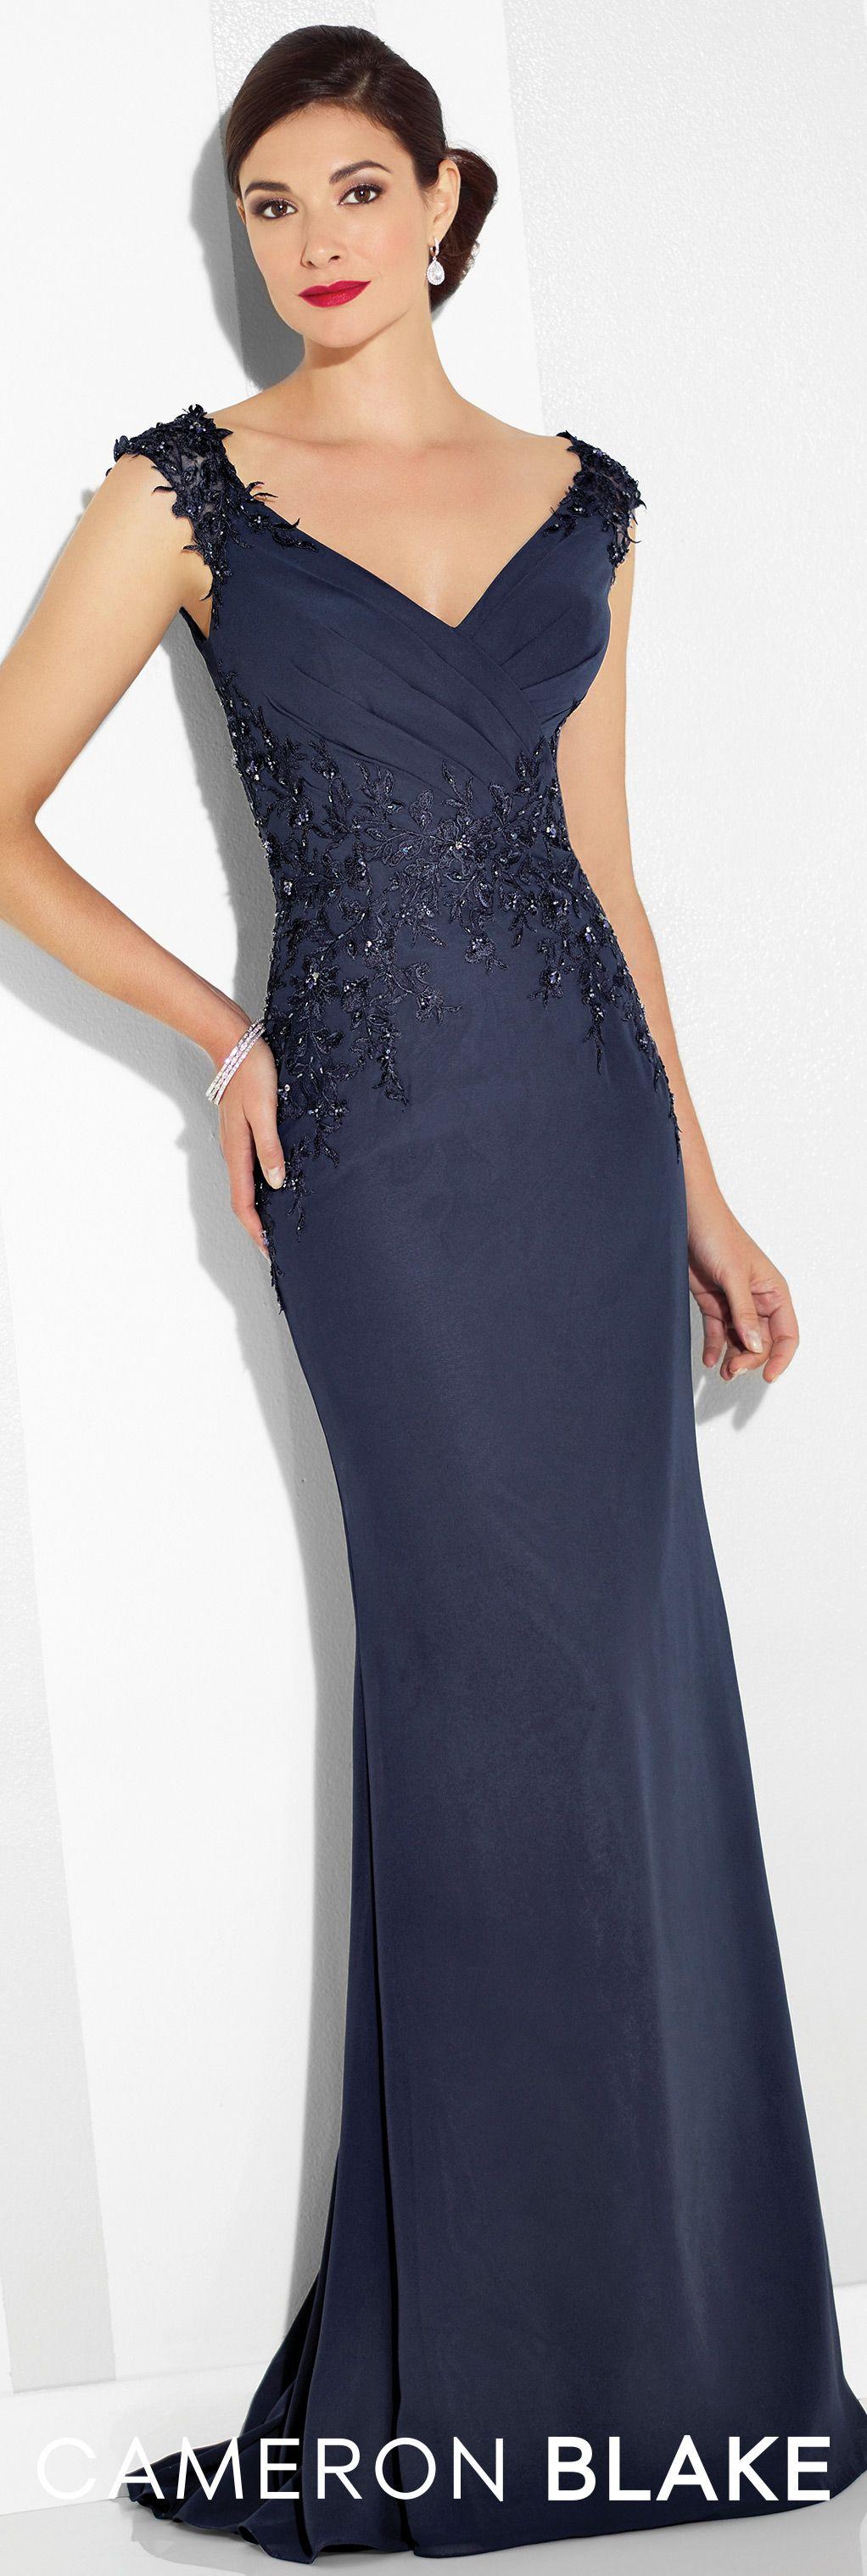 Cameron Blake - Evening Dresses - 117616 | Lace trim, Formal and Cap